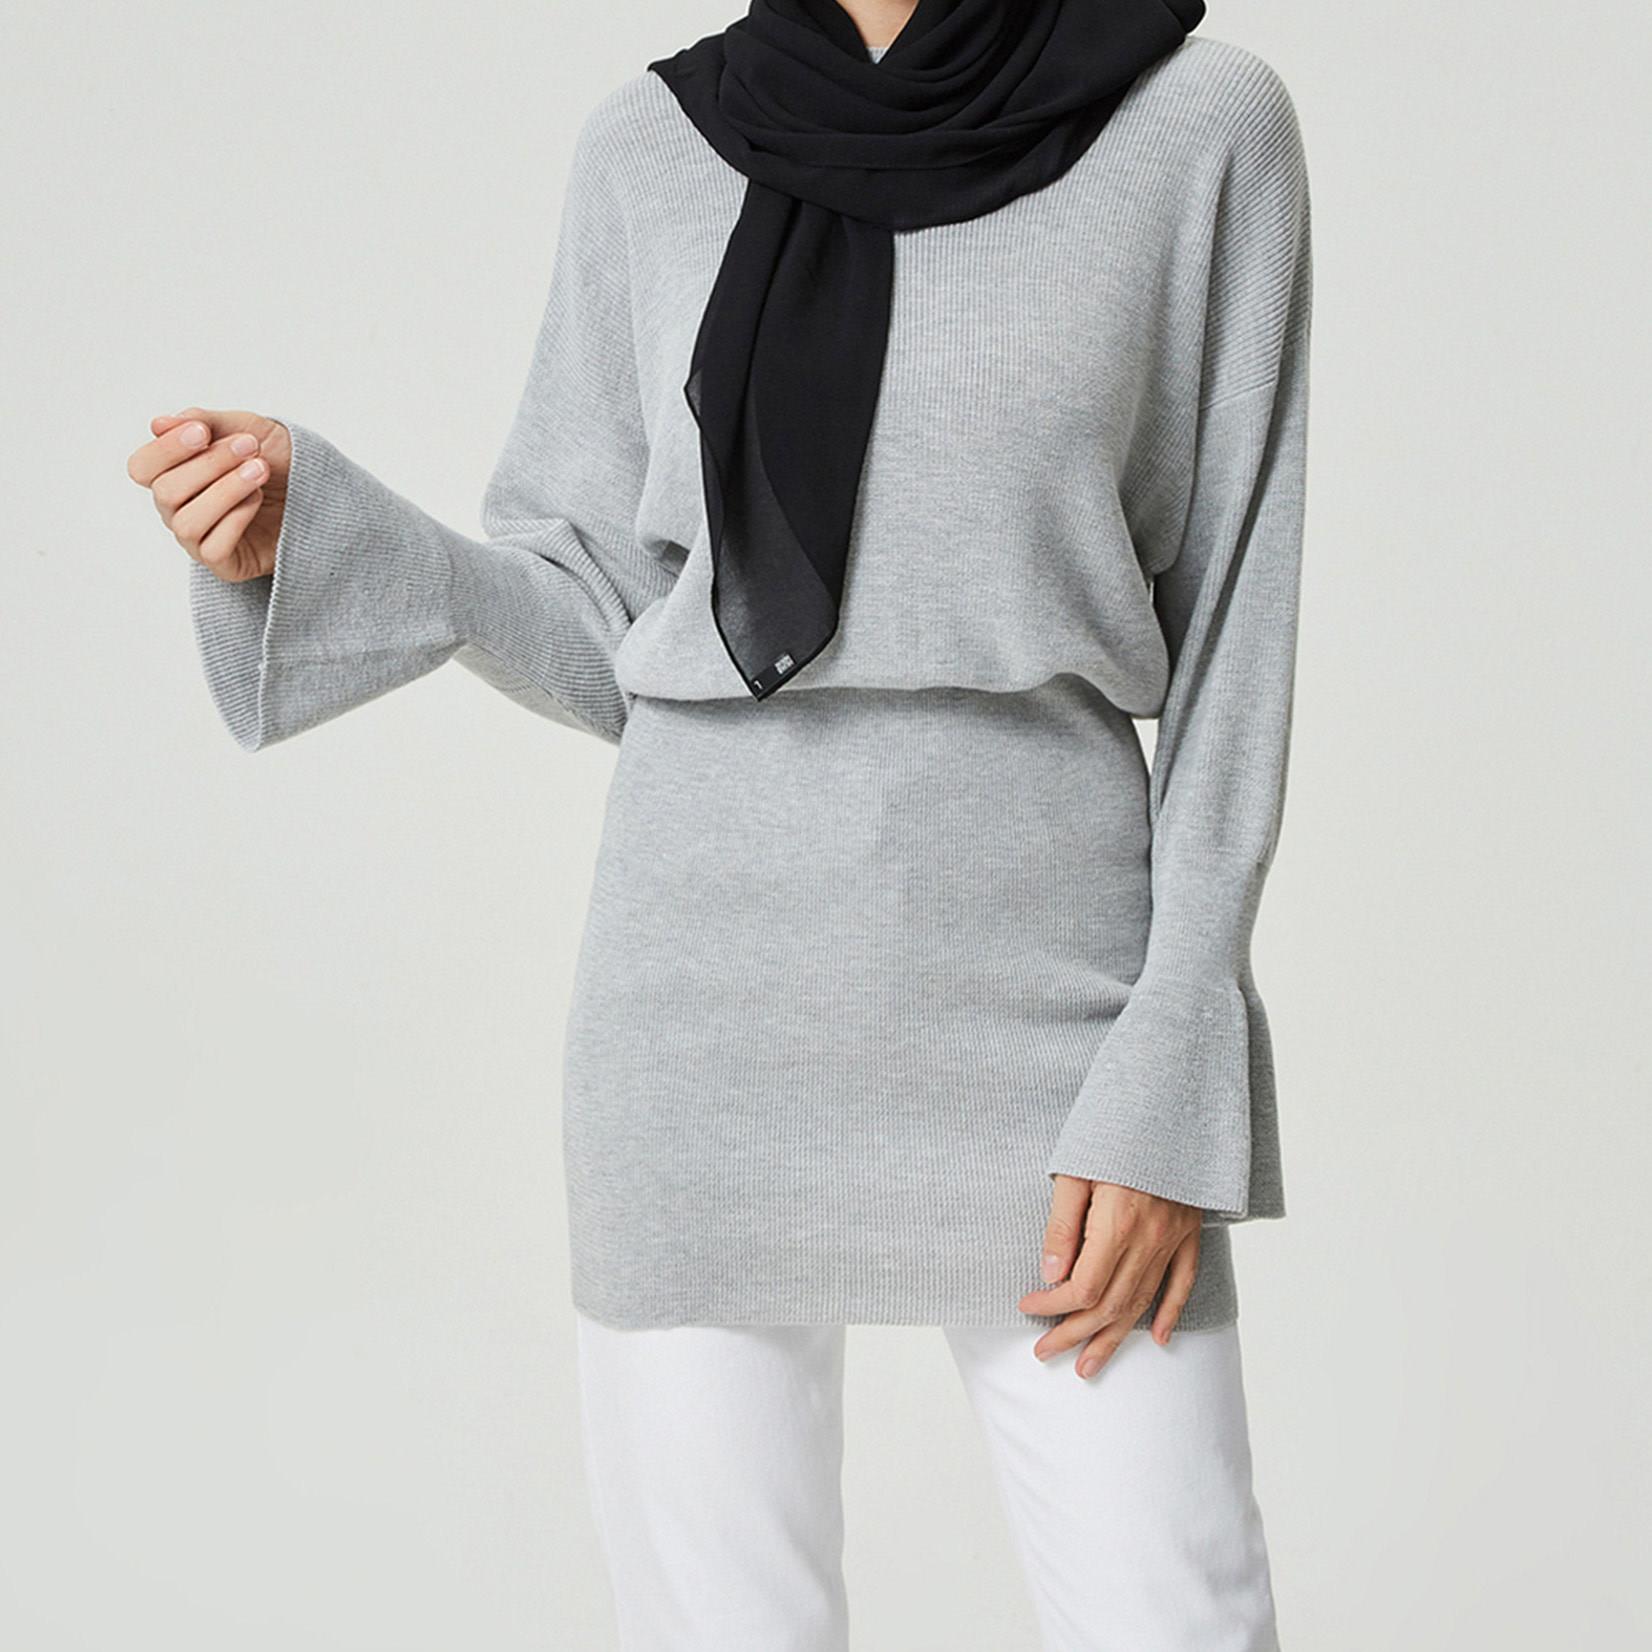 Hijab House Grey Knit Sweater